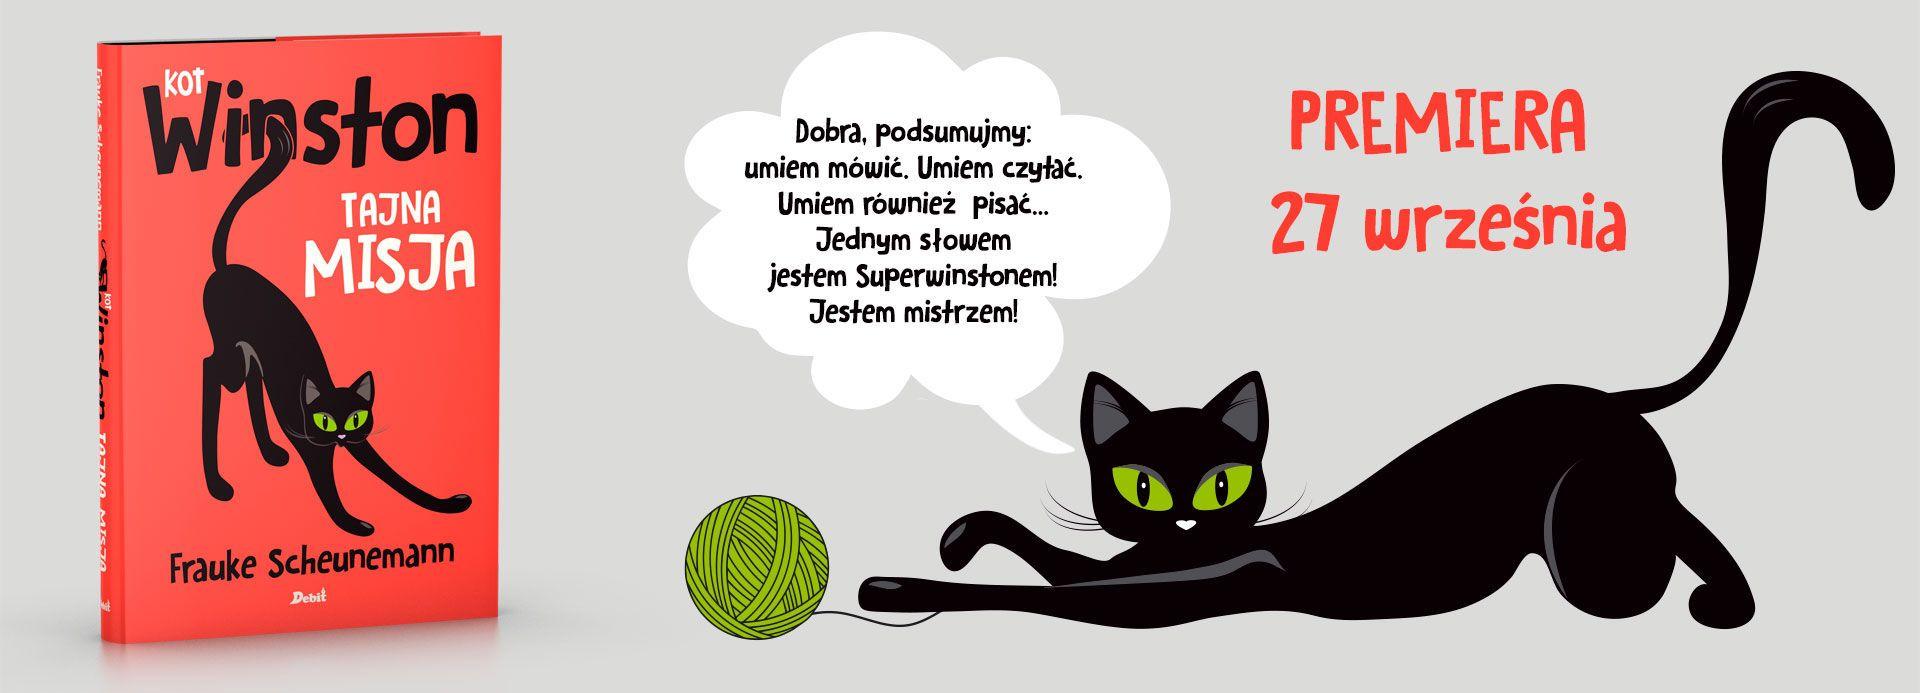 Kot Winston tajna misja premiera książki dla dzieci